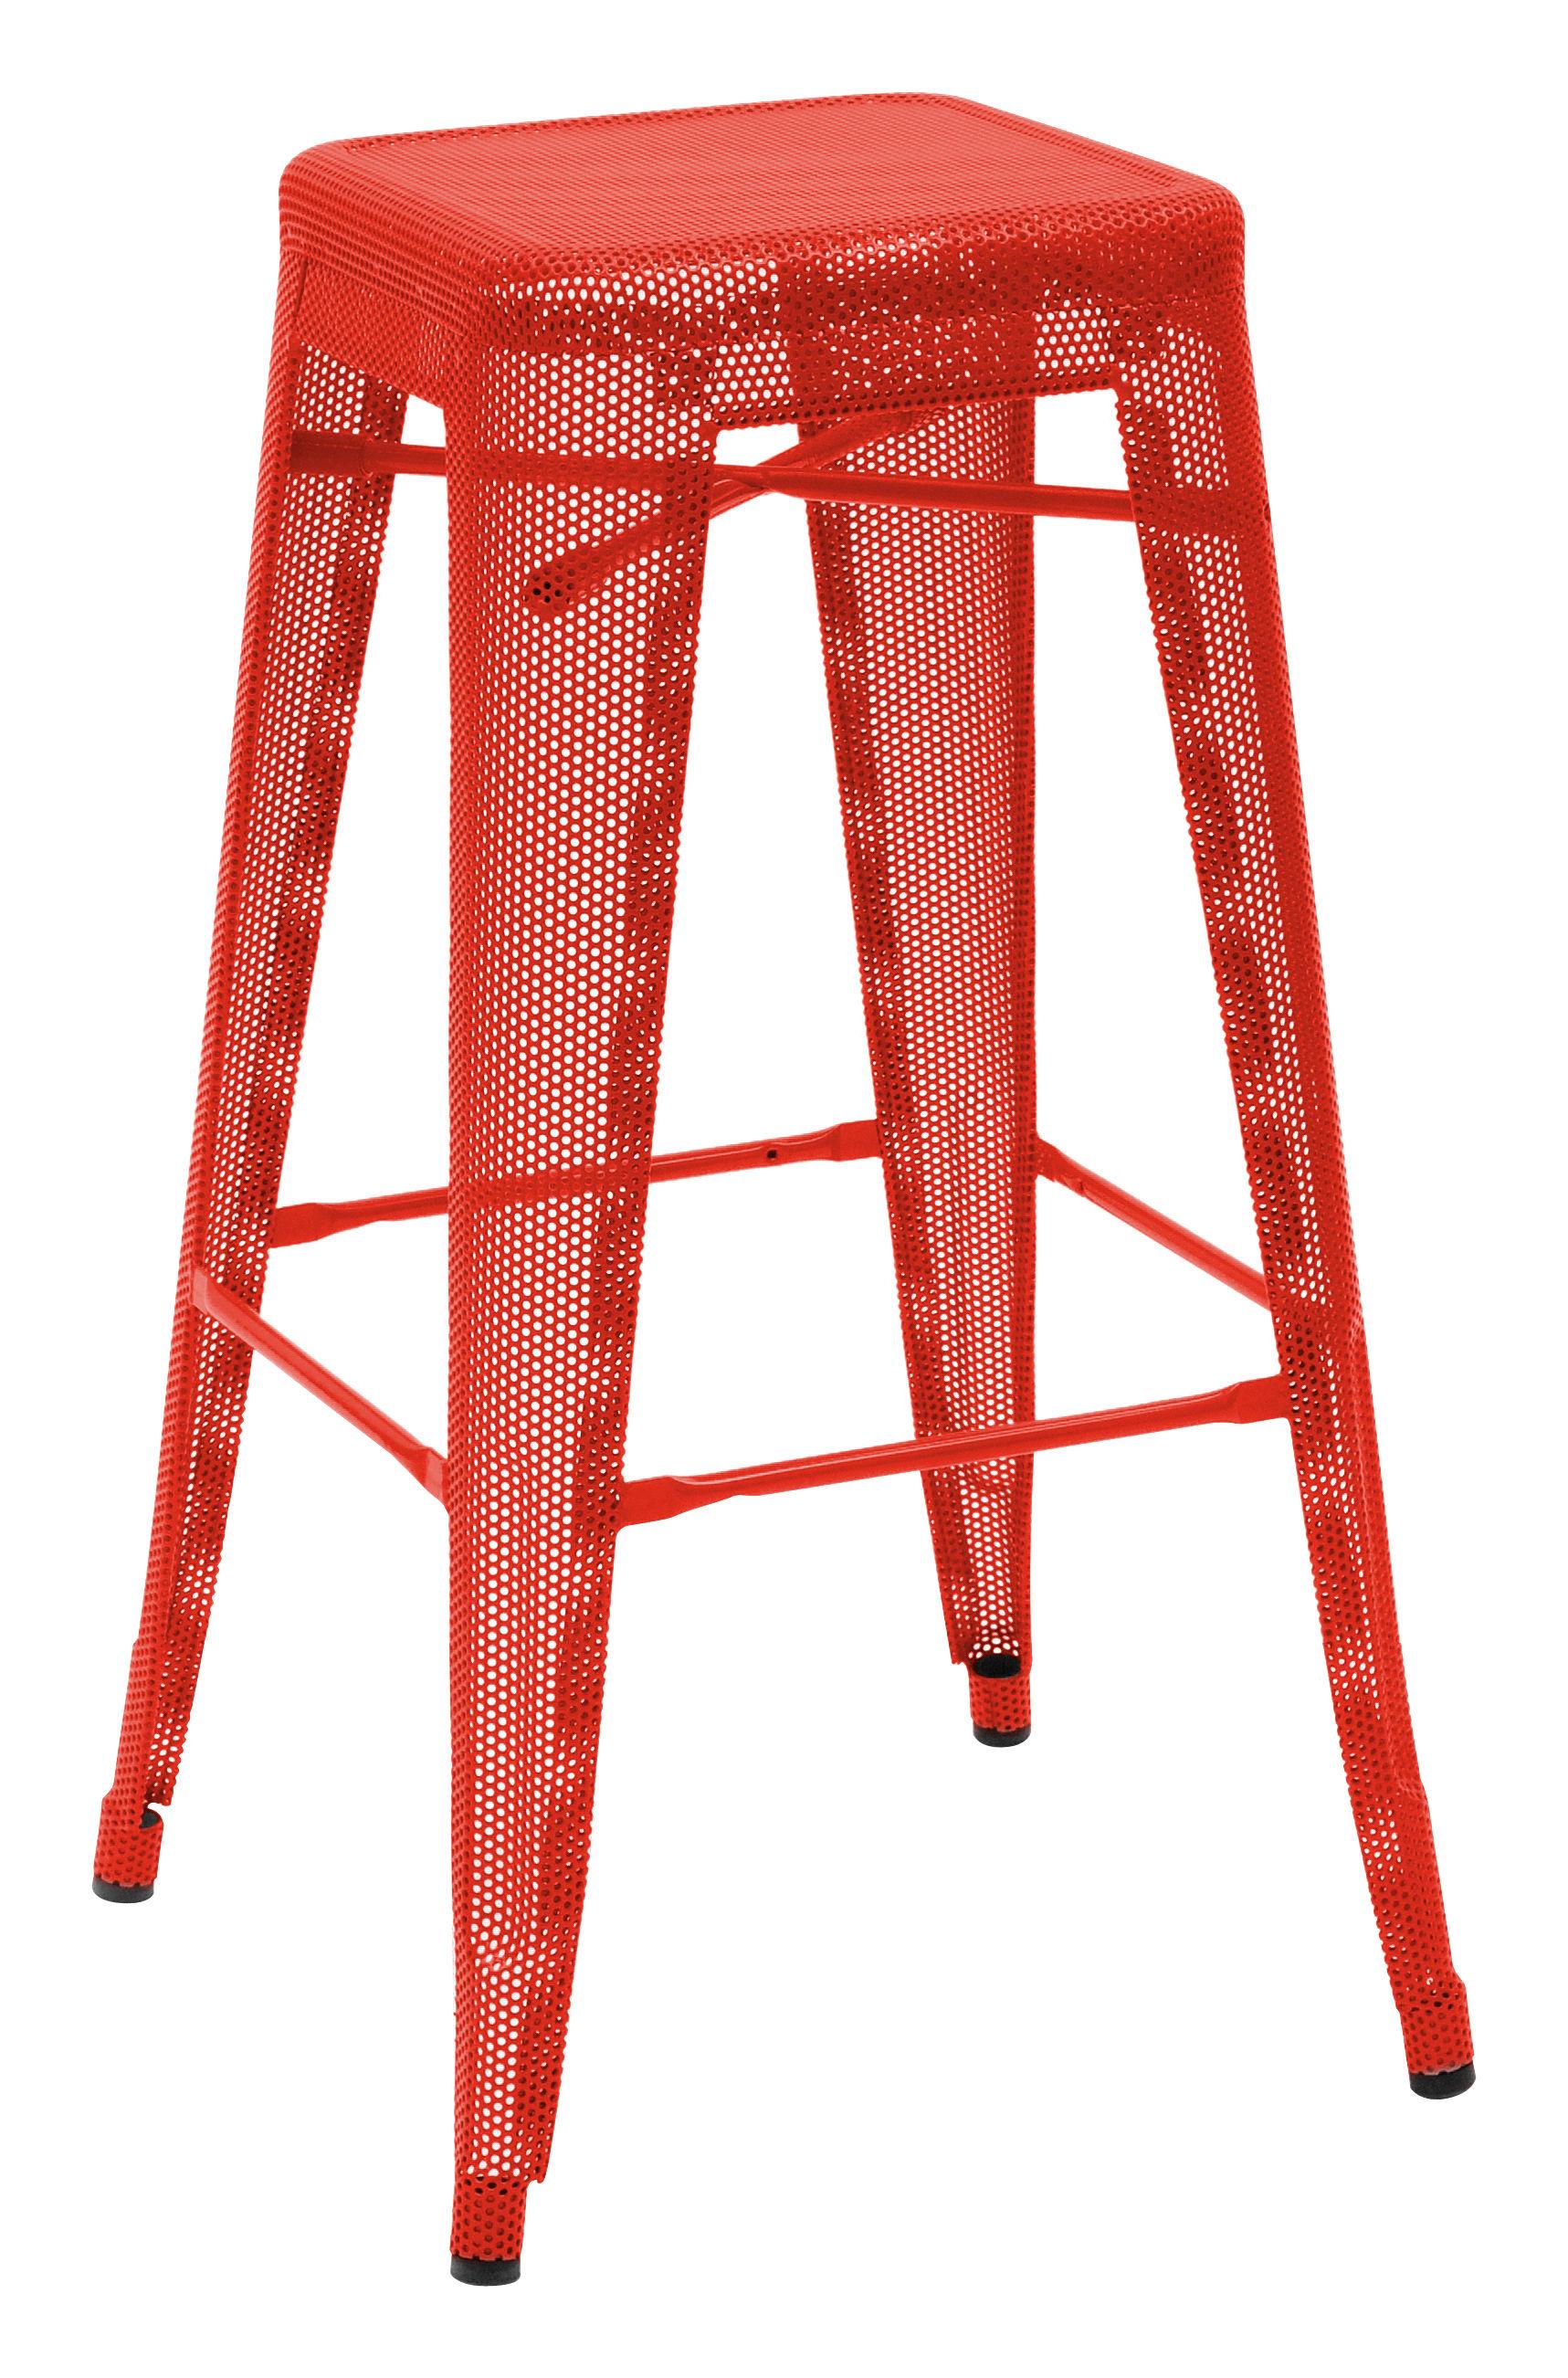 Möbel - Barhocker - H Perforé Barhocker lackiertes Lochblech aus Stahl - H 75 cm - Tolix - Rot - Acier recyclé laqué